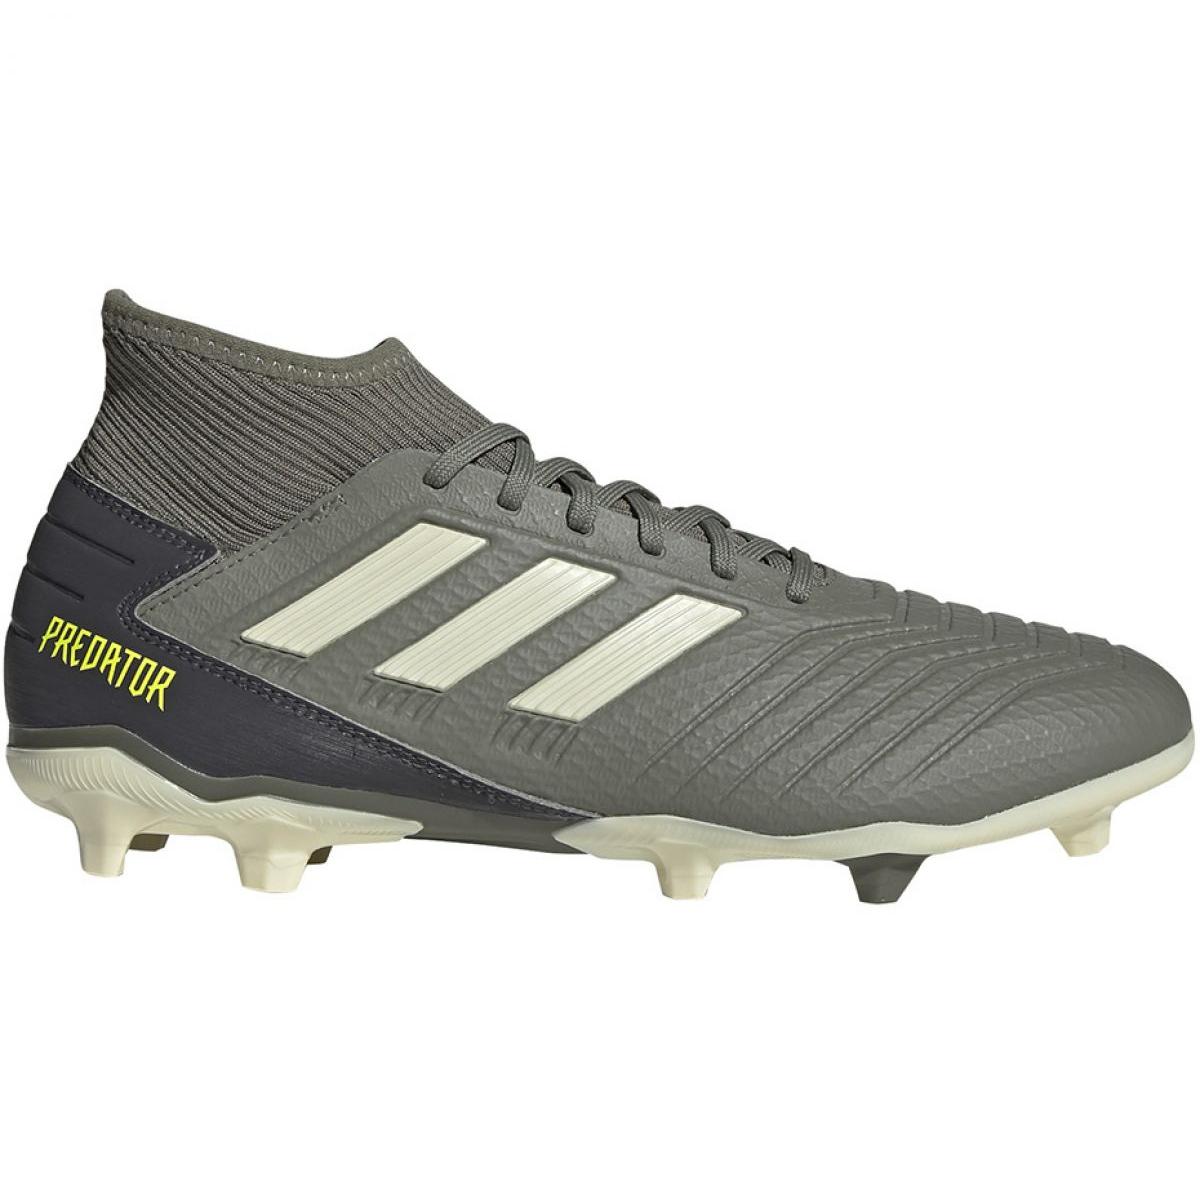 Details about Adidas Predator 19.3 Fg M EF8208 football shoes grey gray silver